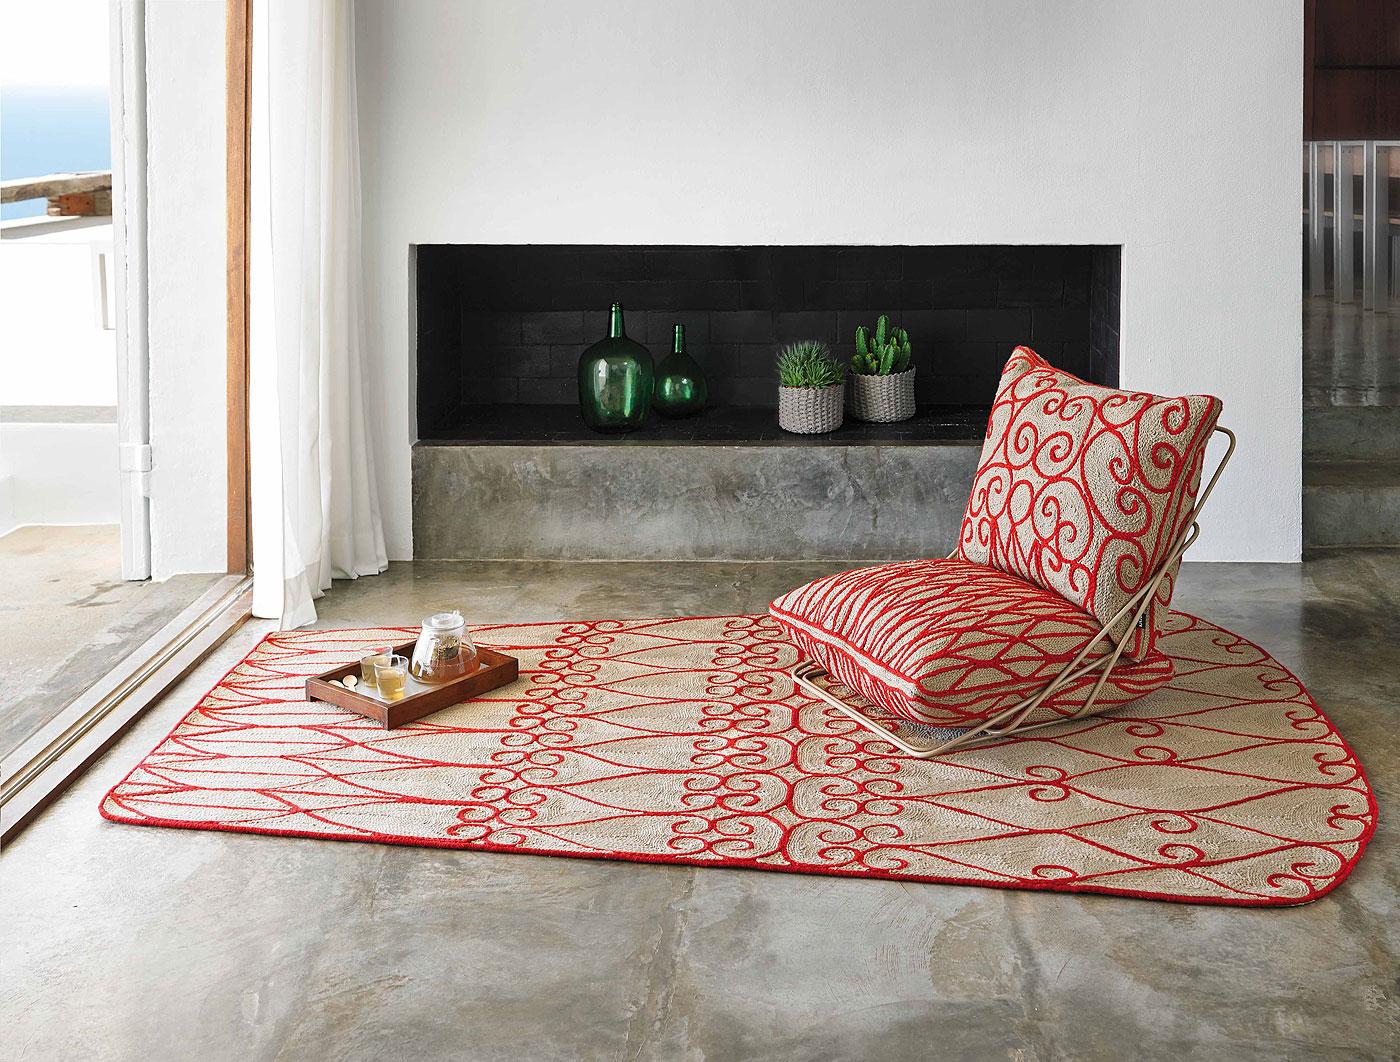 alfombra-valentina-alejandra-gandia-blasco (1)